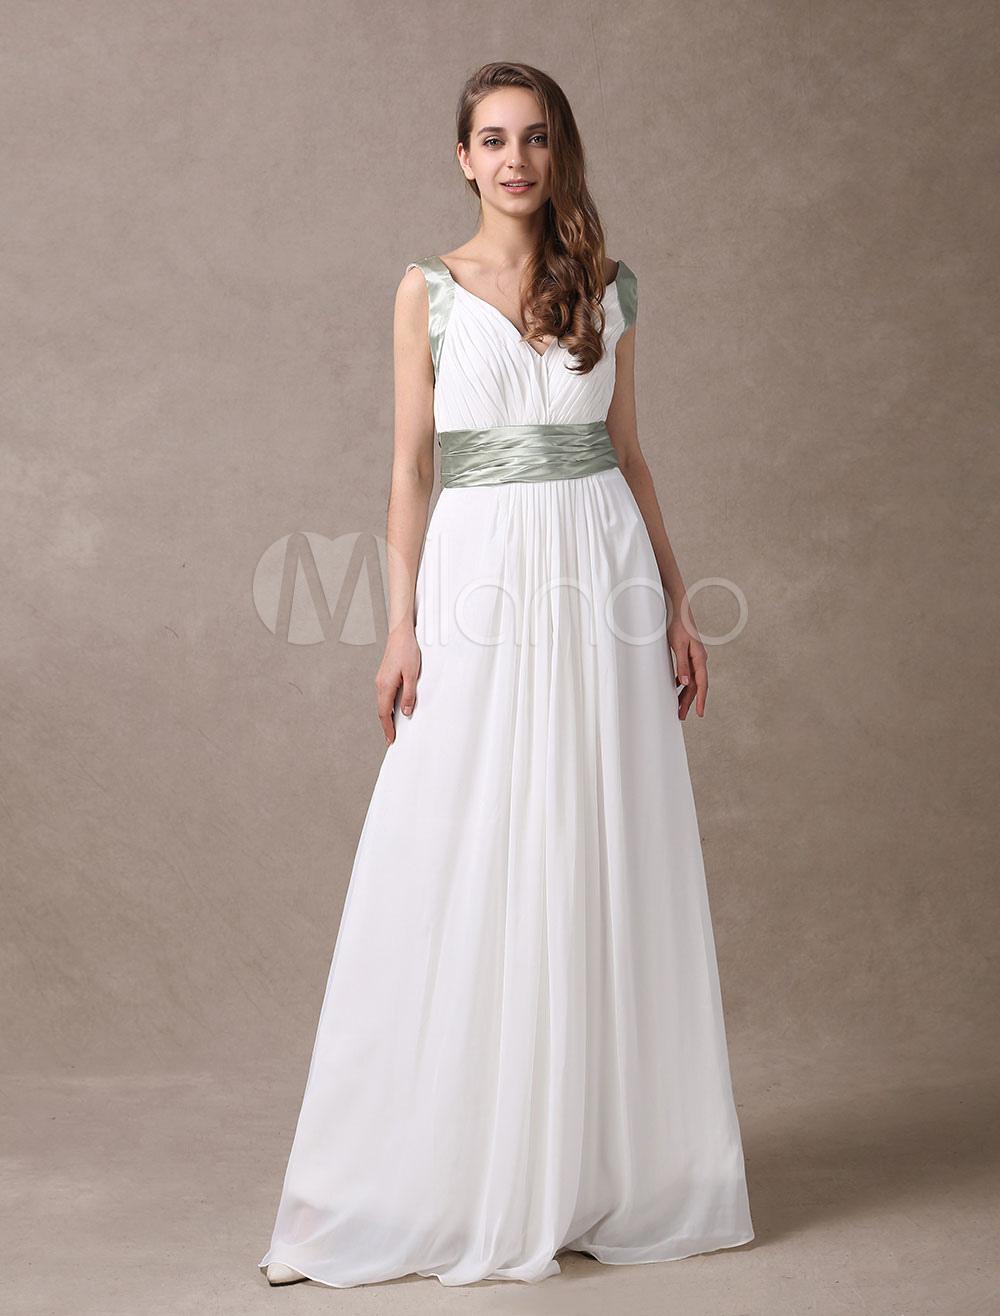 Buy Attractive Ivory Chiffon Deep V-neck Maternity Bridesmaid Dress for $129.99 in Milanoo store